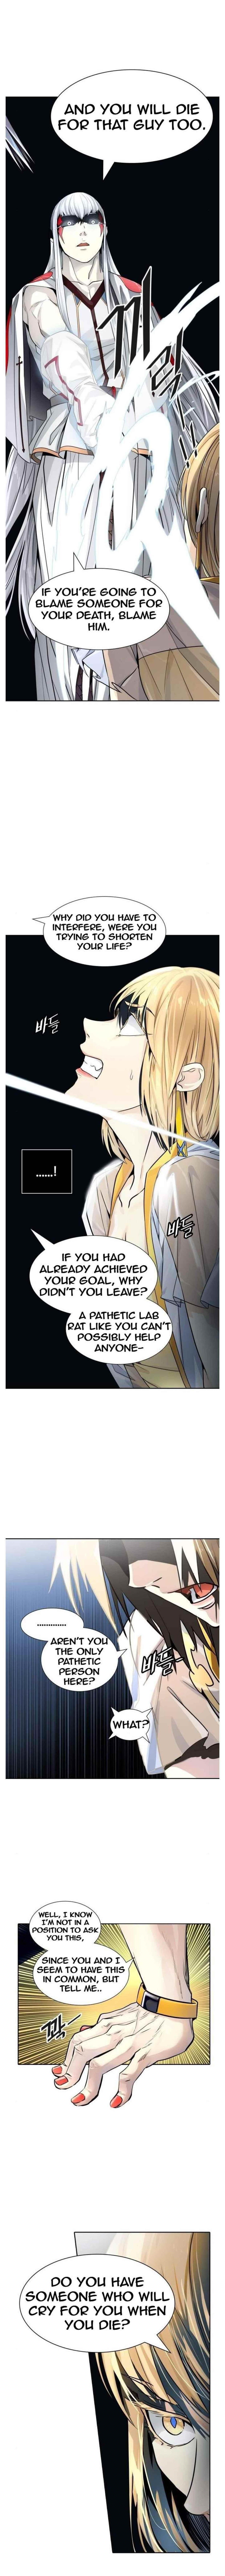 Tower Of God Chapter 506 page 19 - Mangakakalot